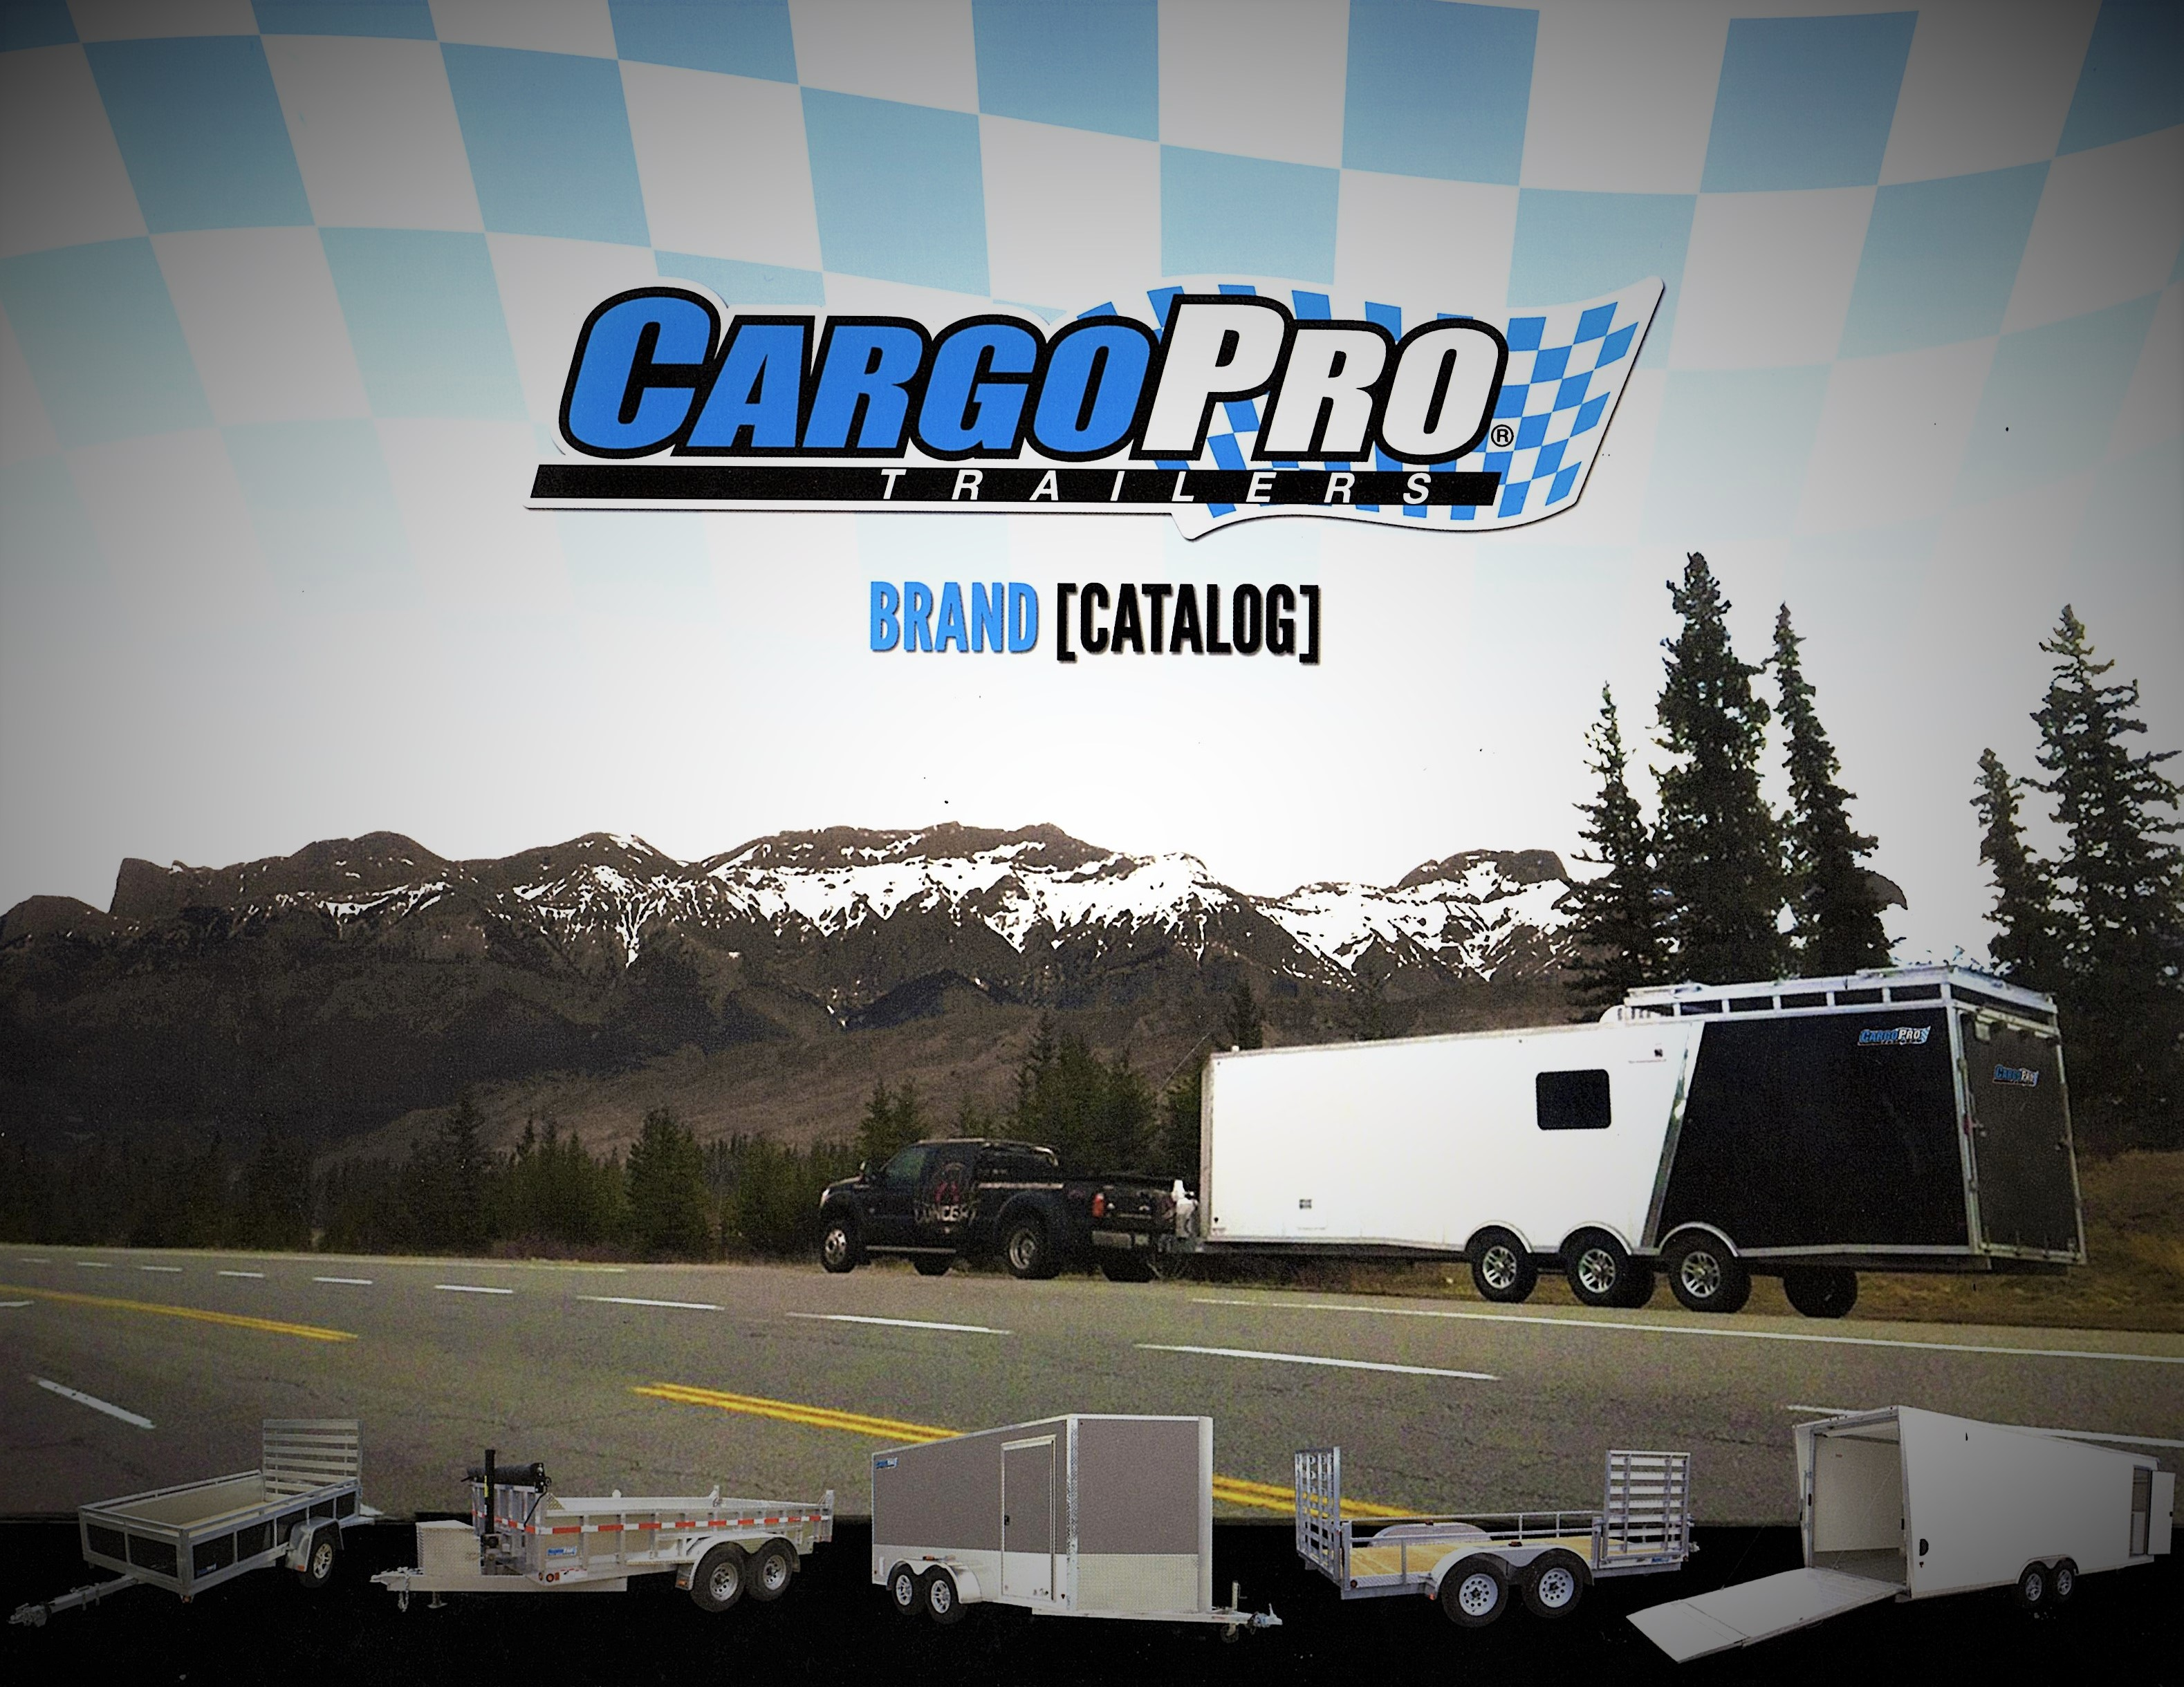 Cargo Pro Trailers info spec